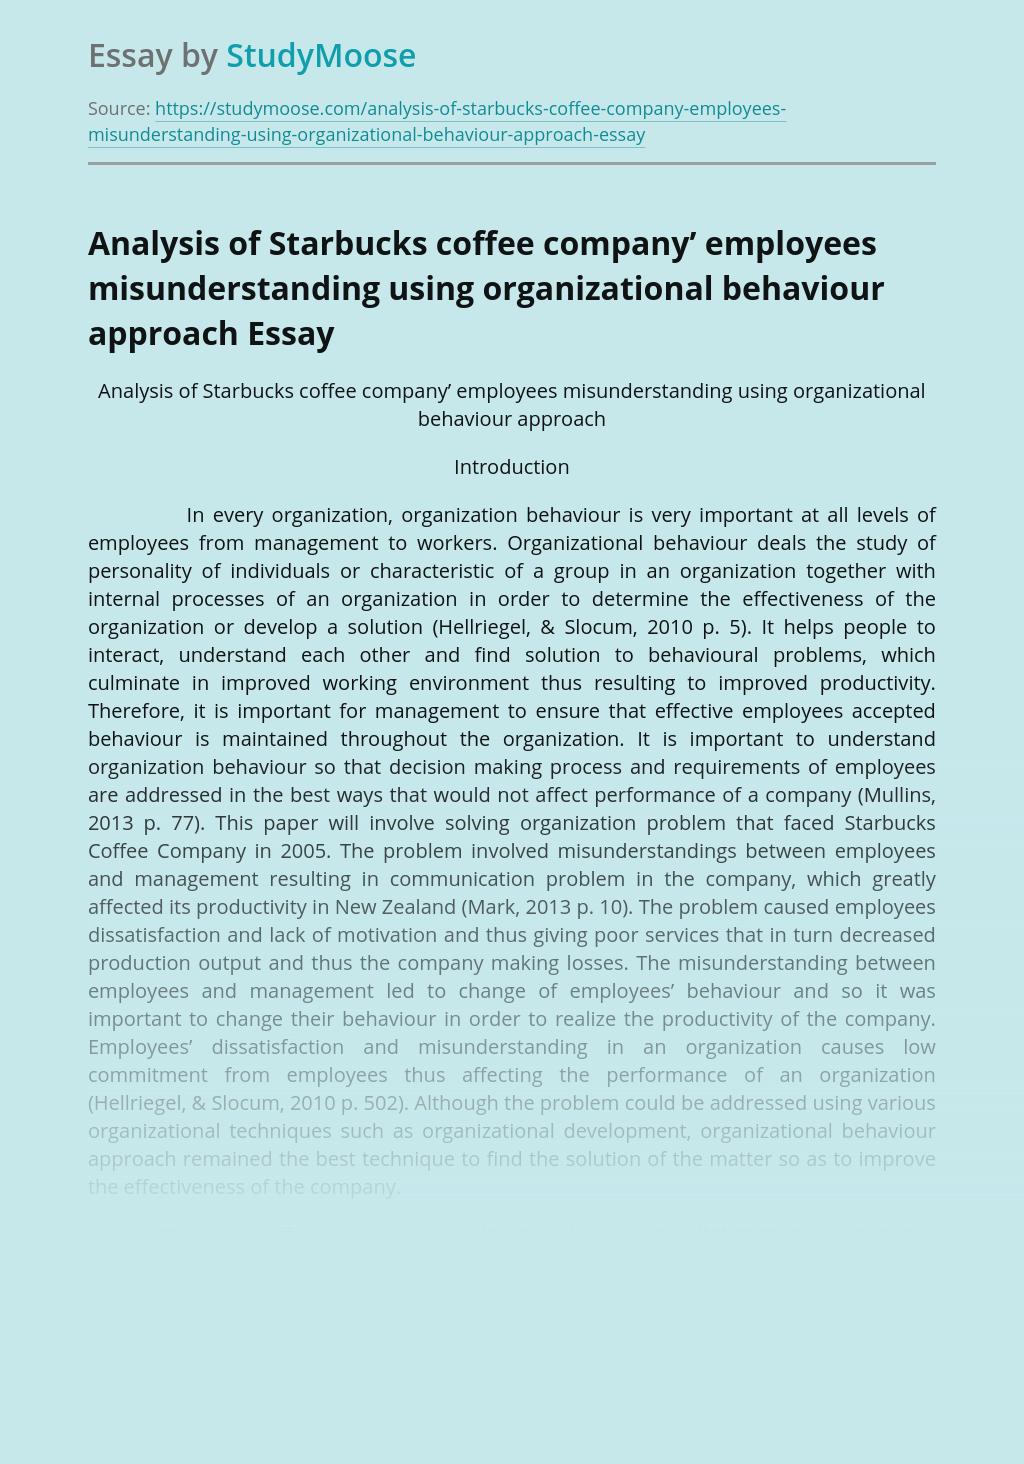 Analysis of Starbucks coffee company' employees misunderstanding using organizational behaviour approach